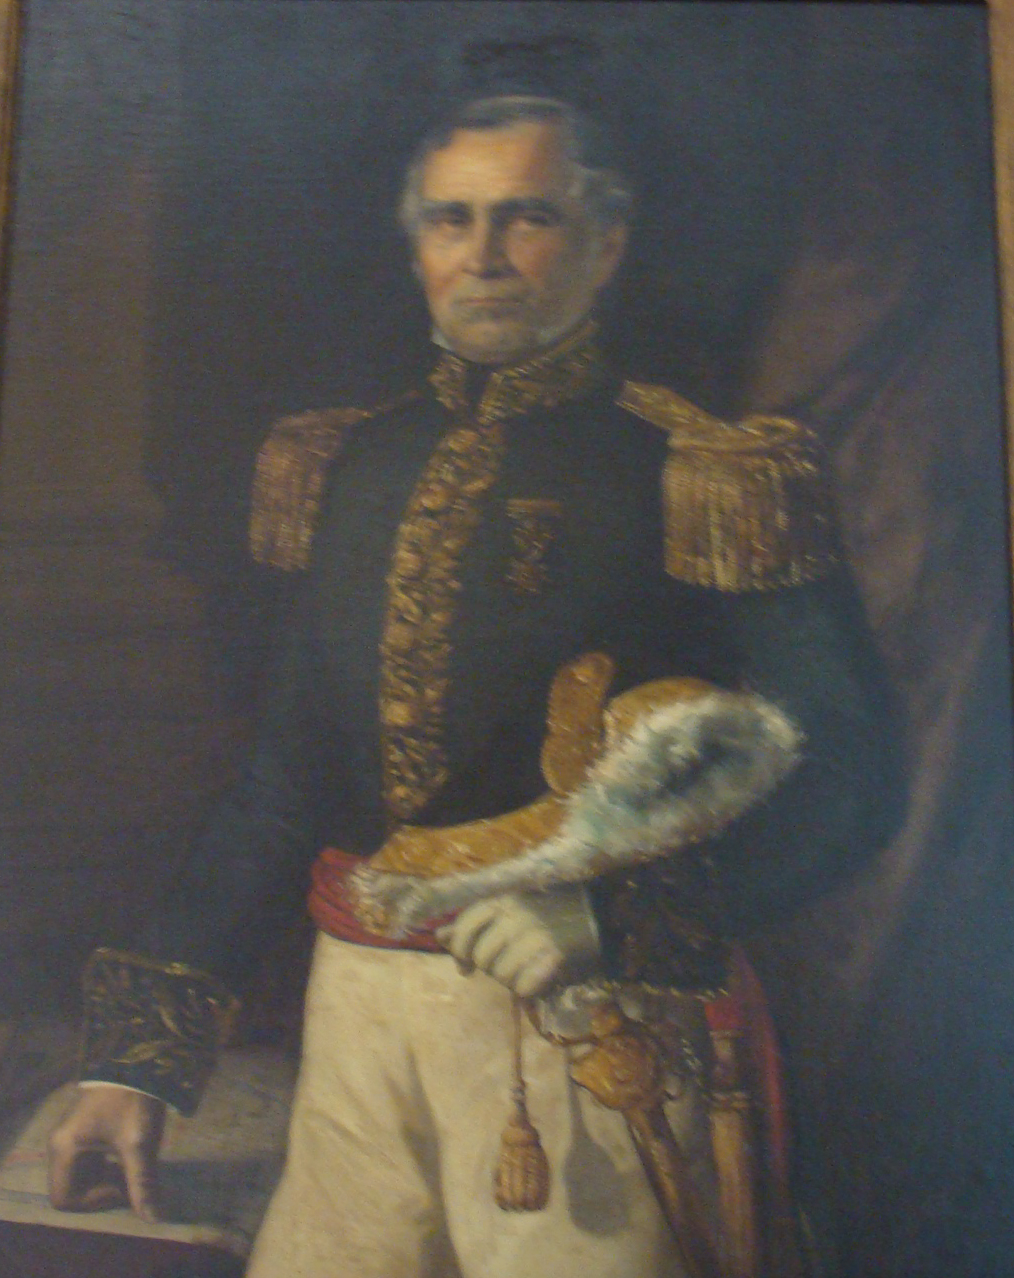 General jose maria Zamora